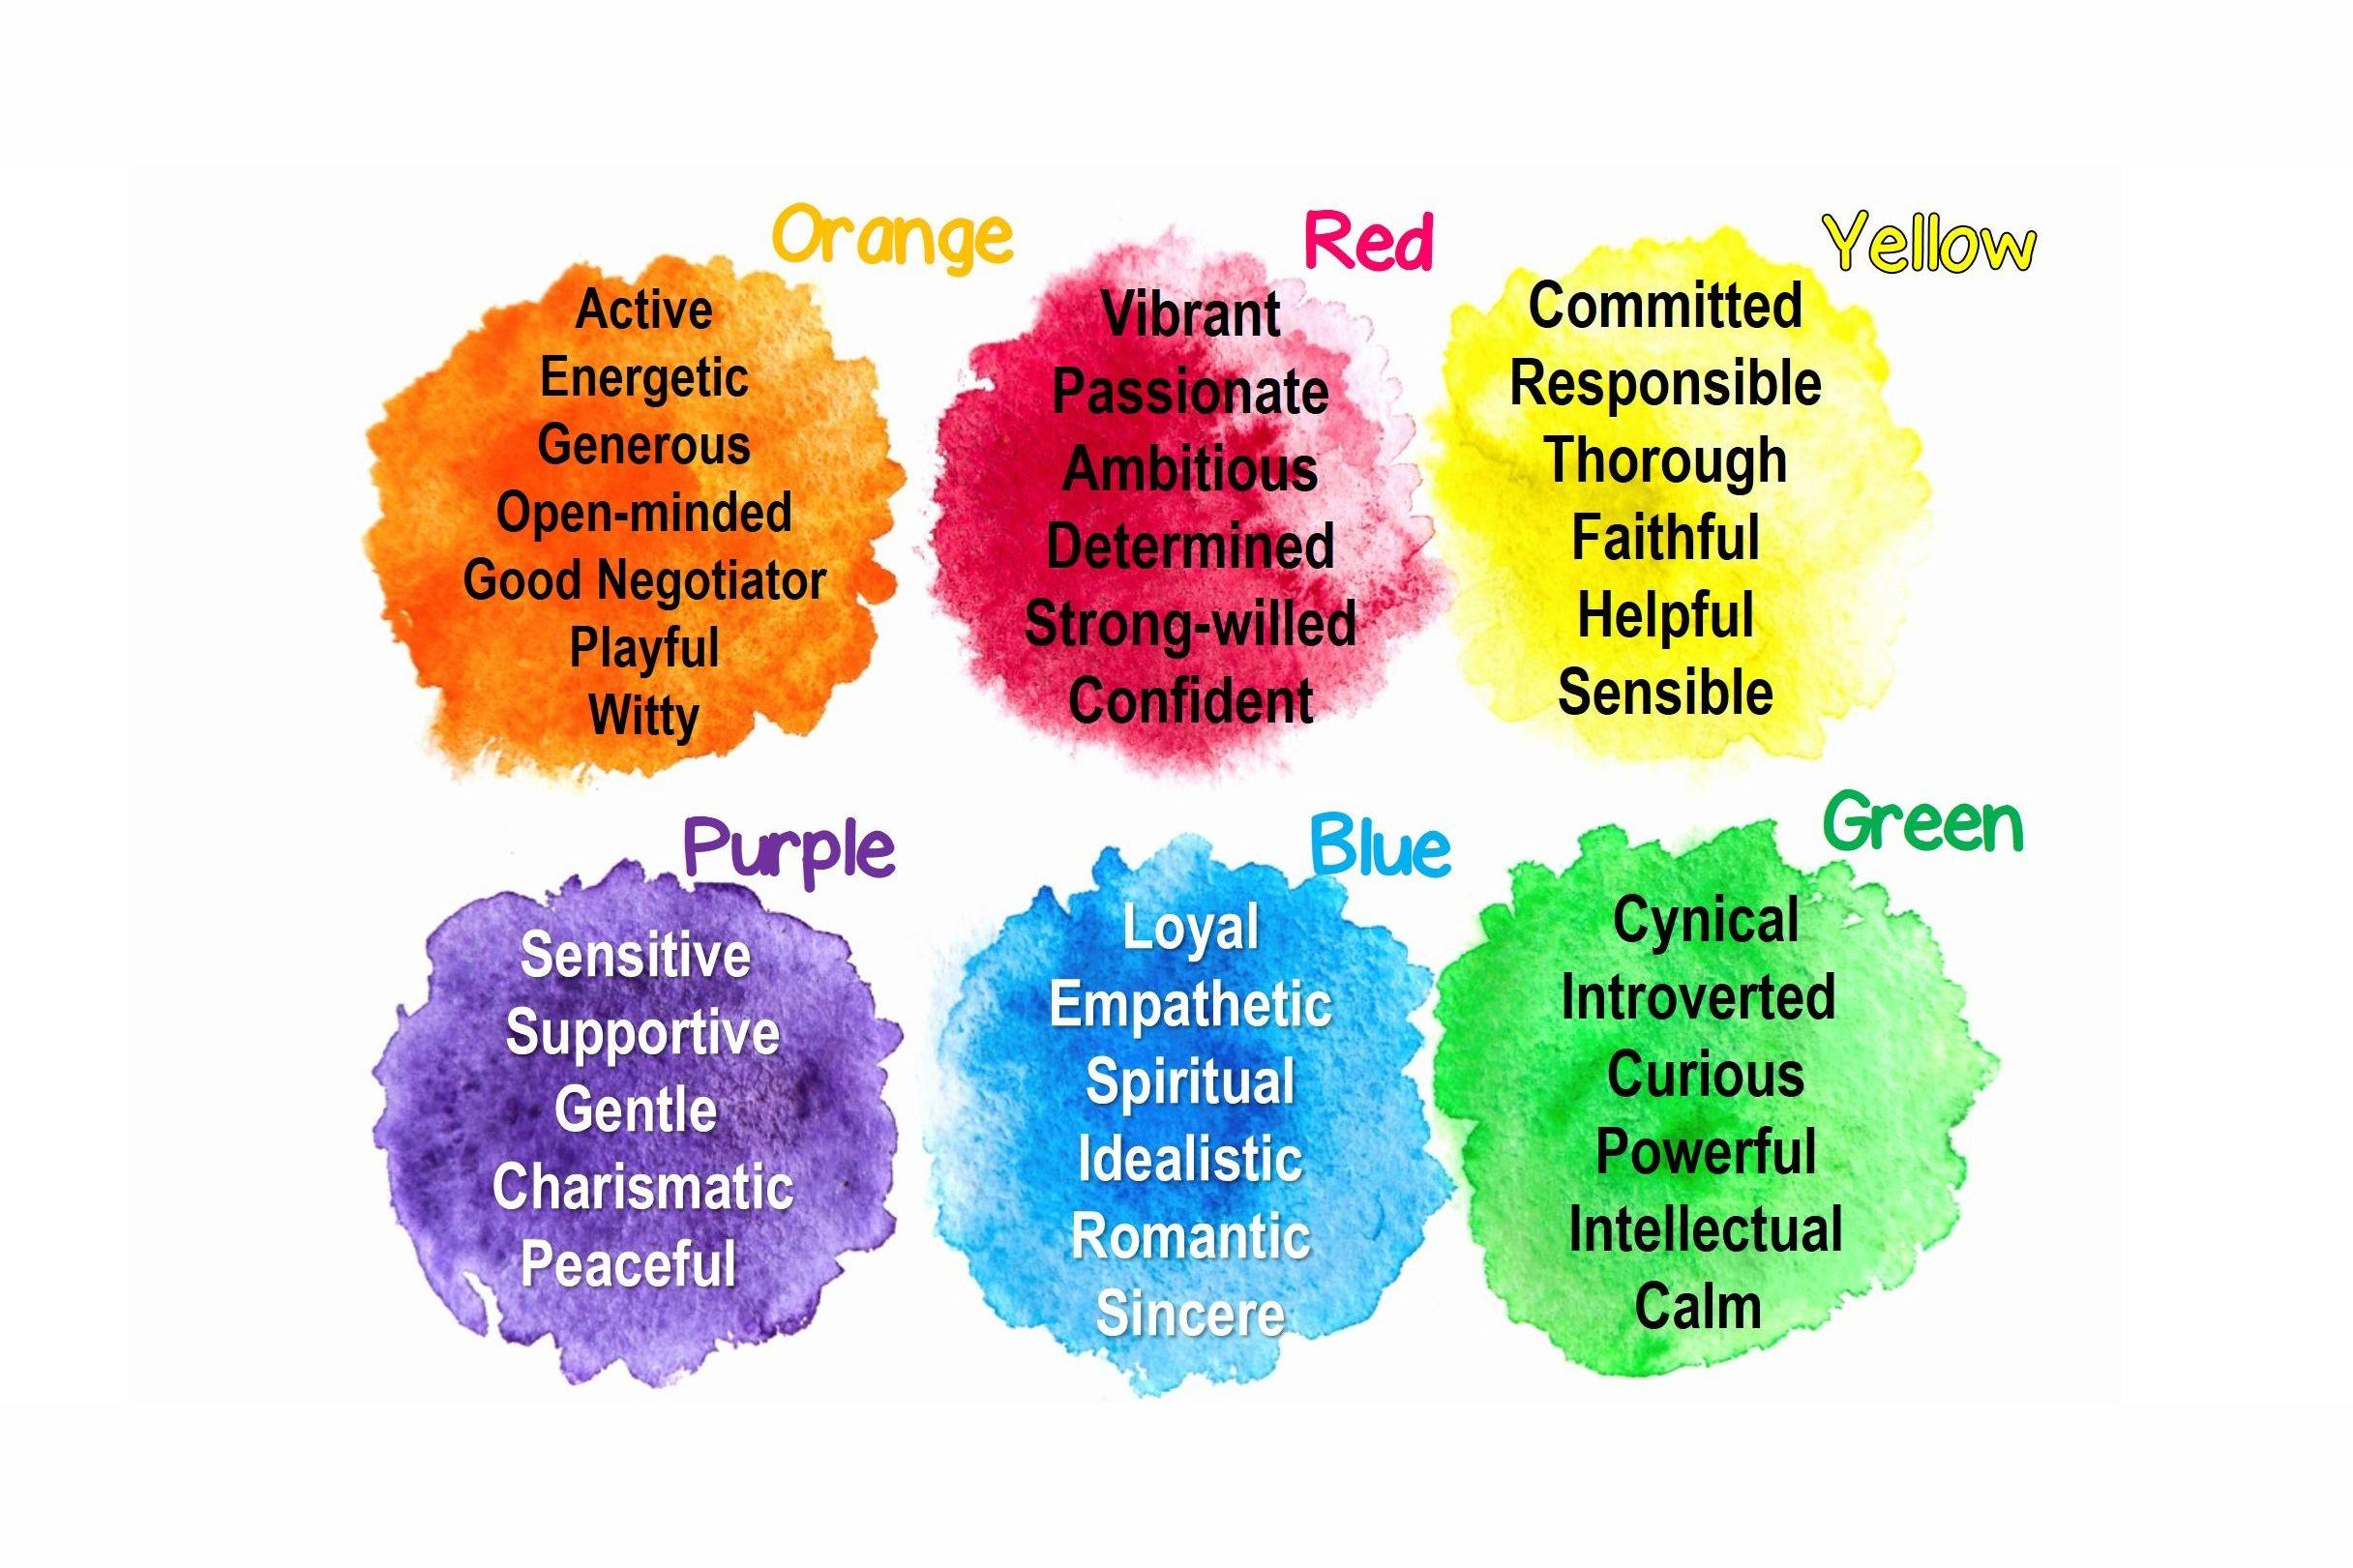 Colors online test true Orange, Gold,